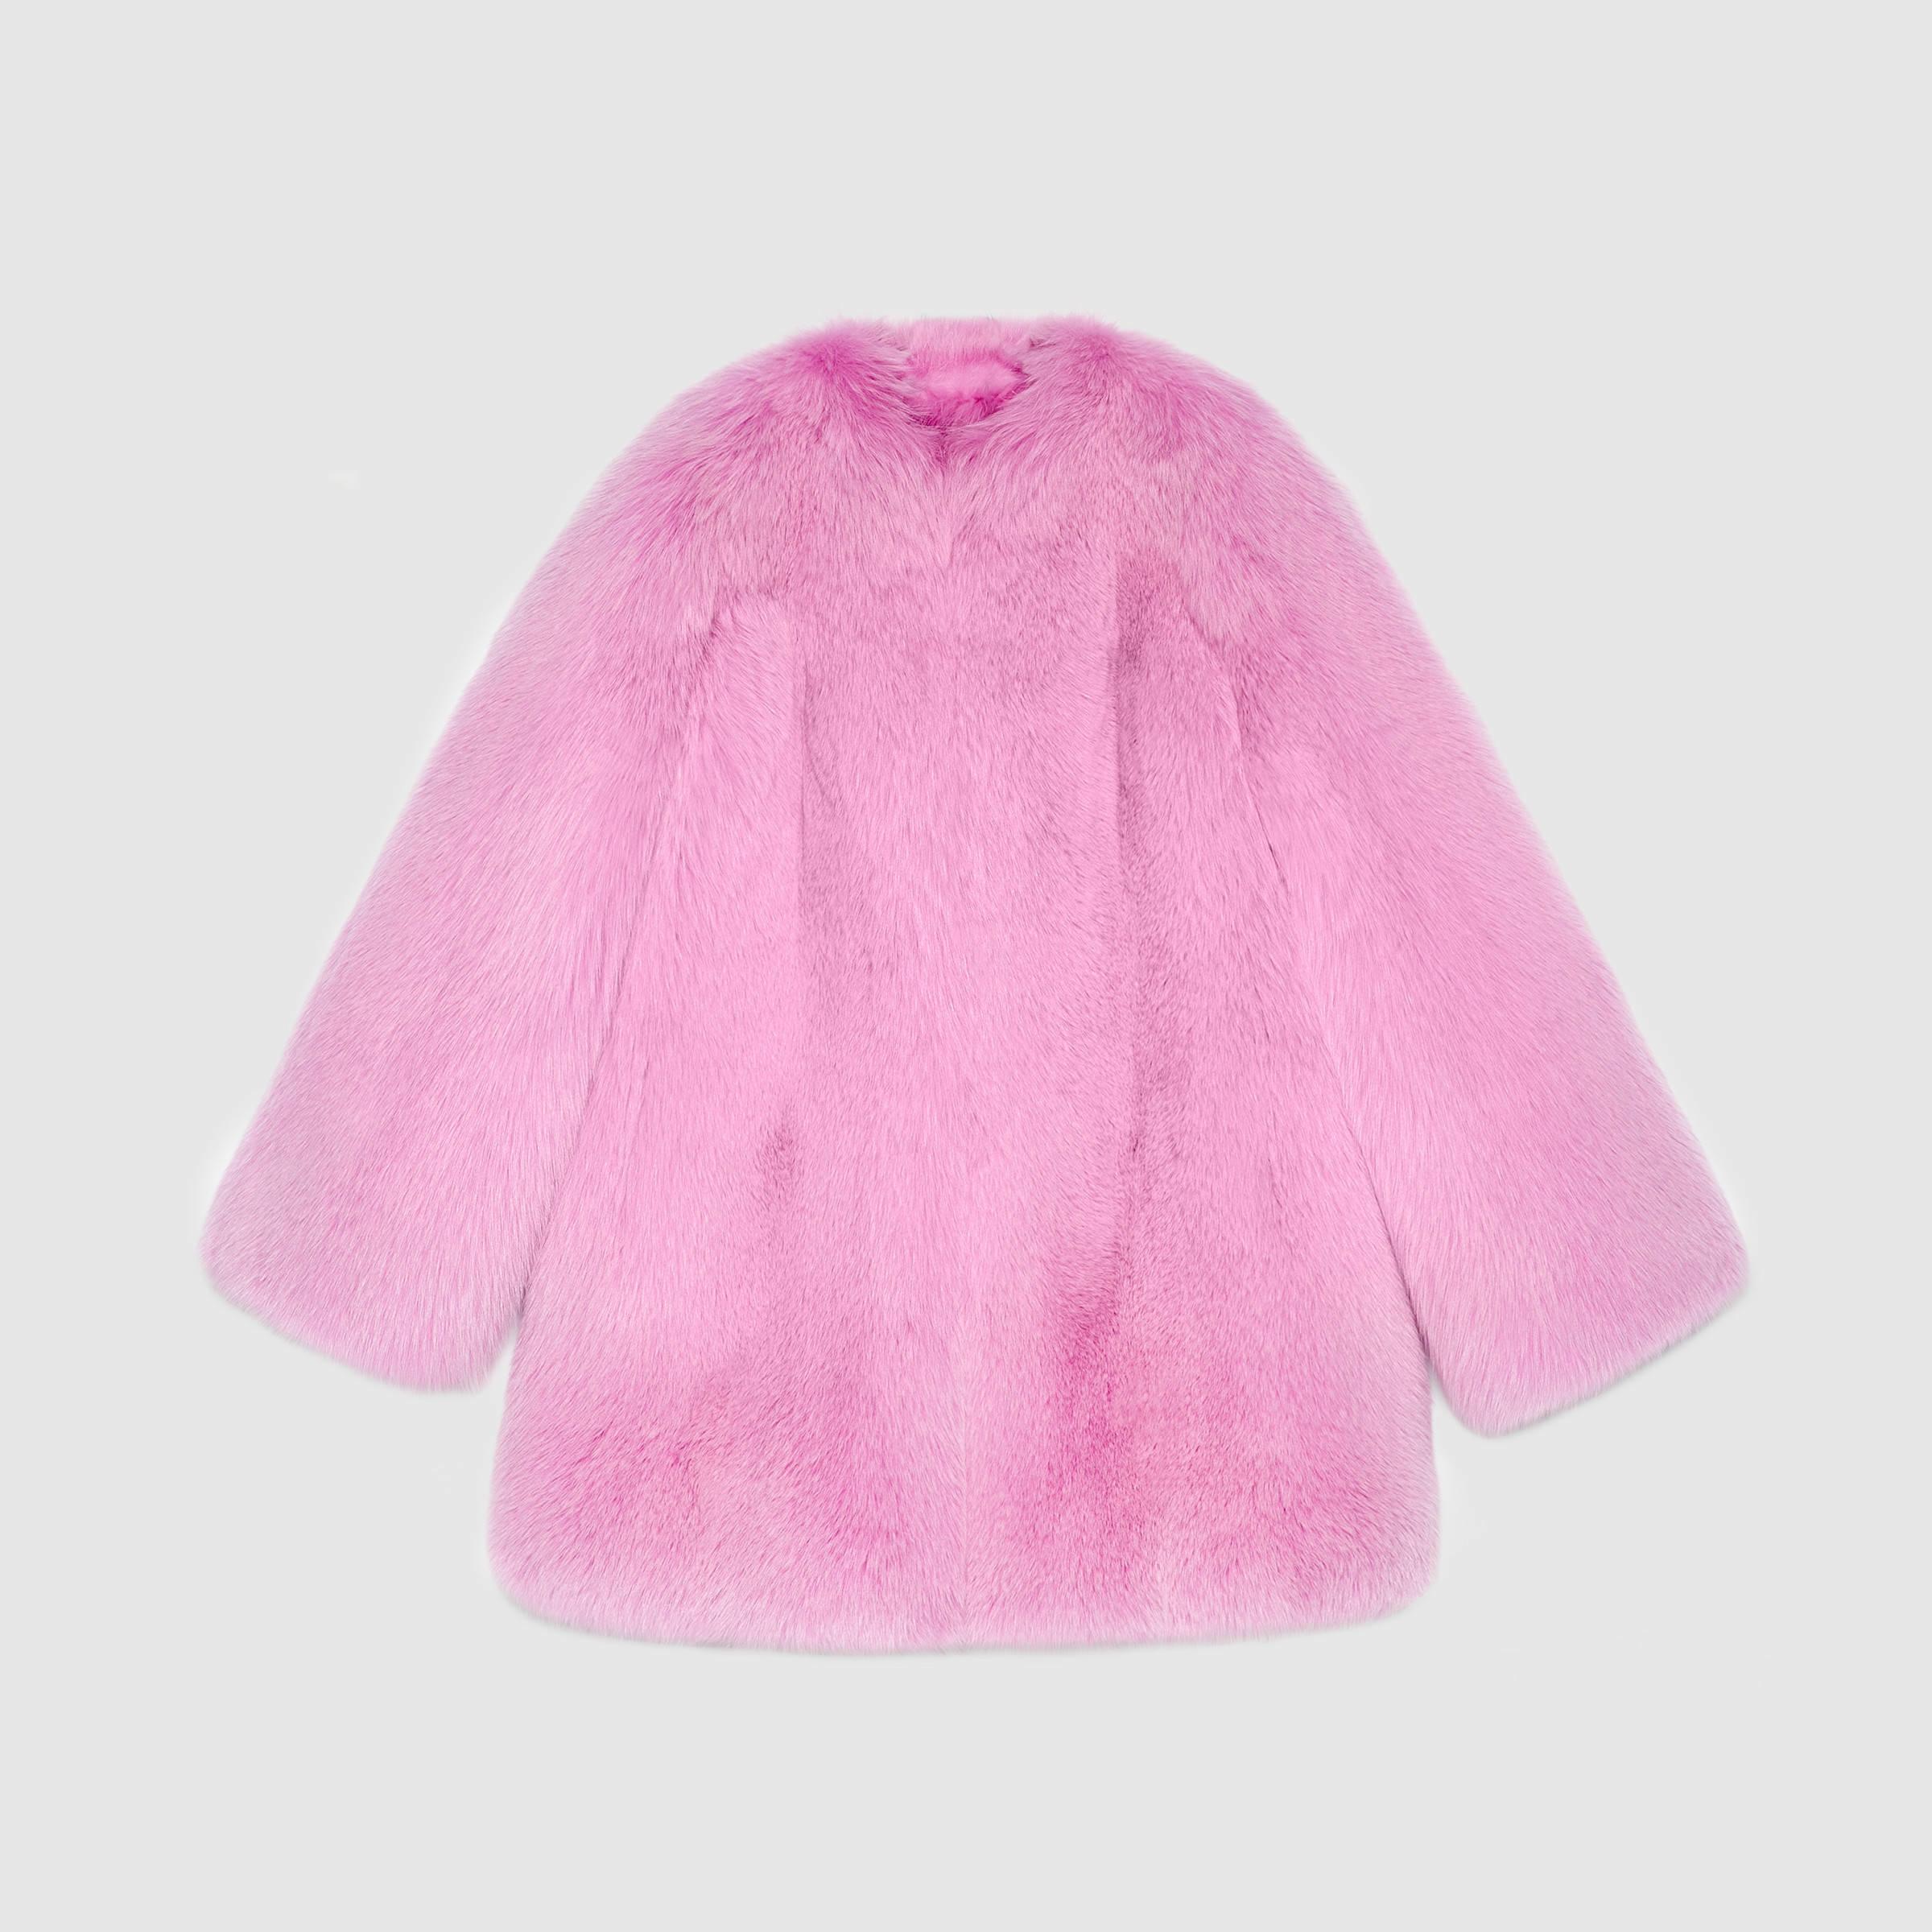 2db4a223af69 Lyst - Gucci Fox Fur Coat